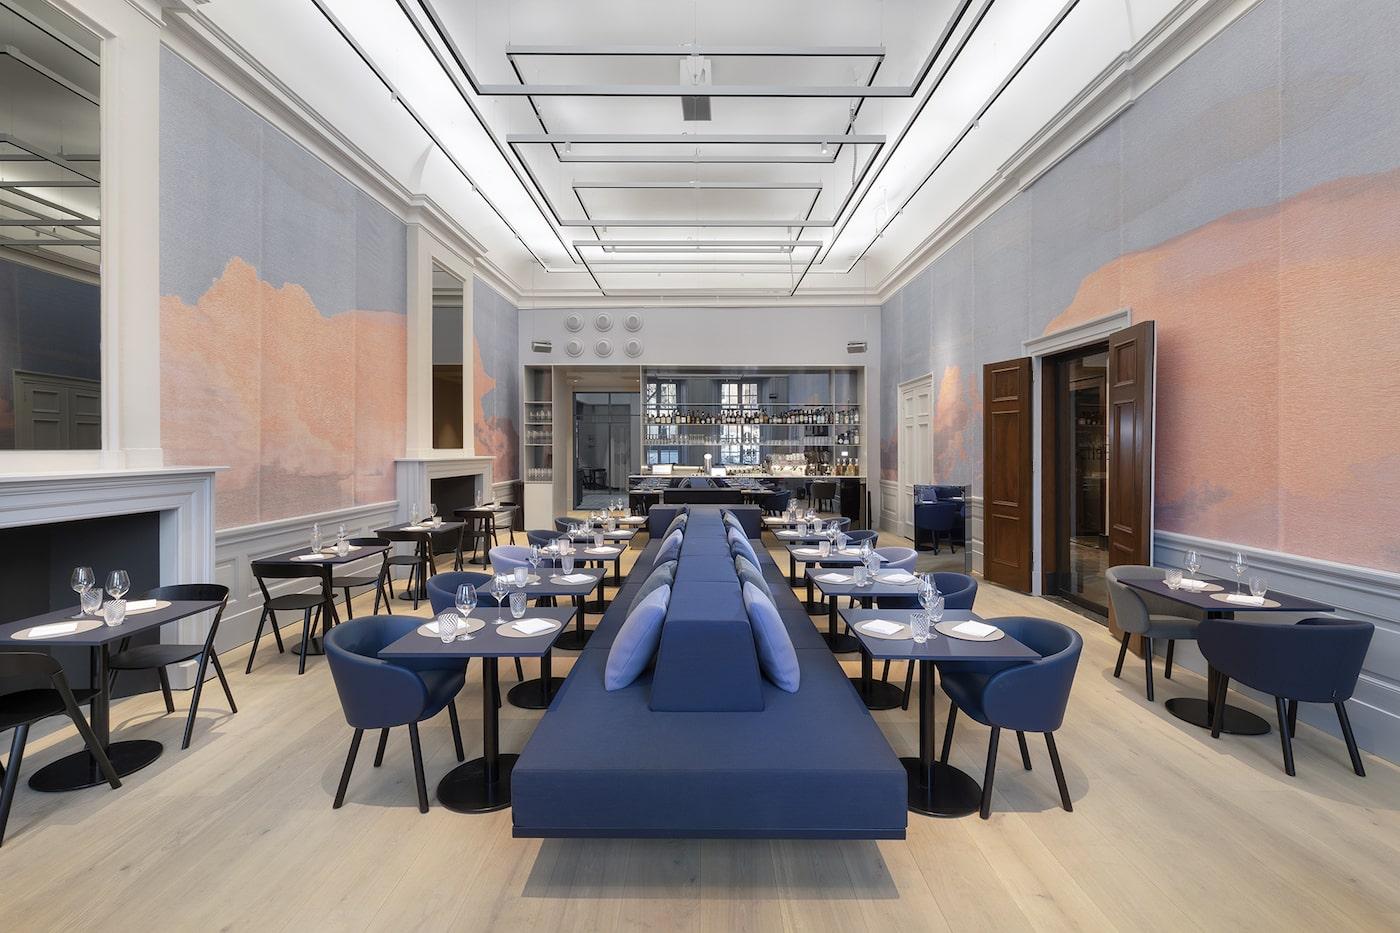 Restaurant with blue seating in Felix Meritis